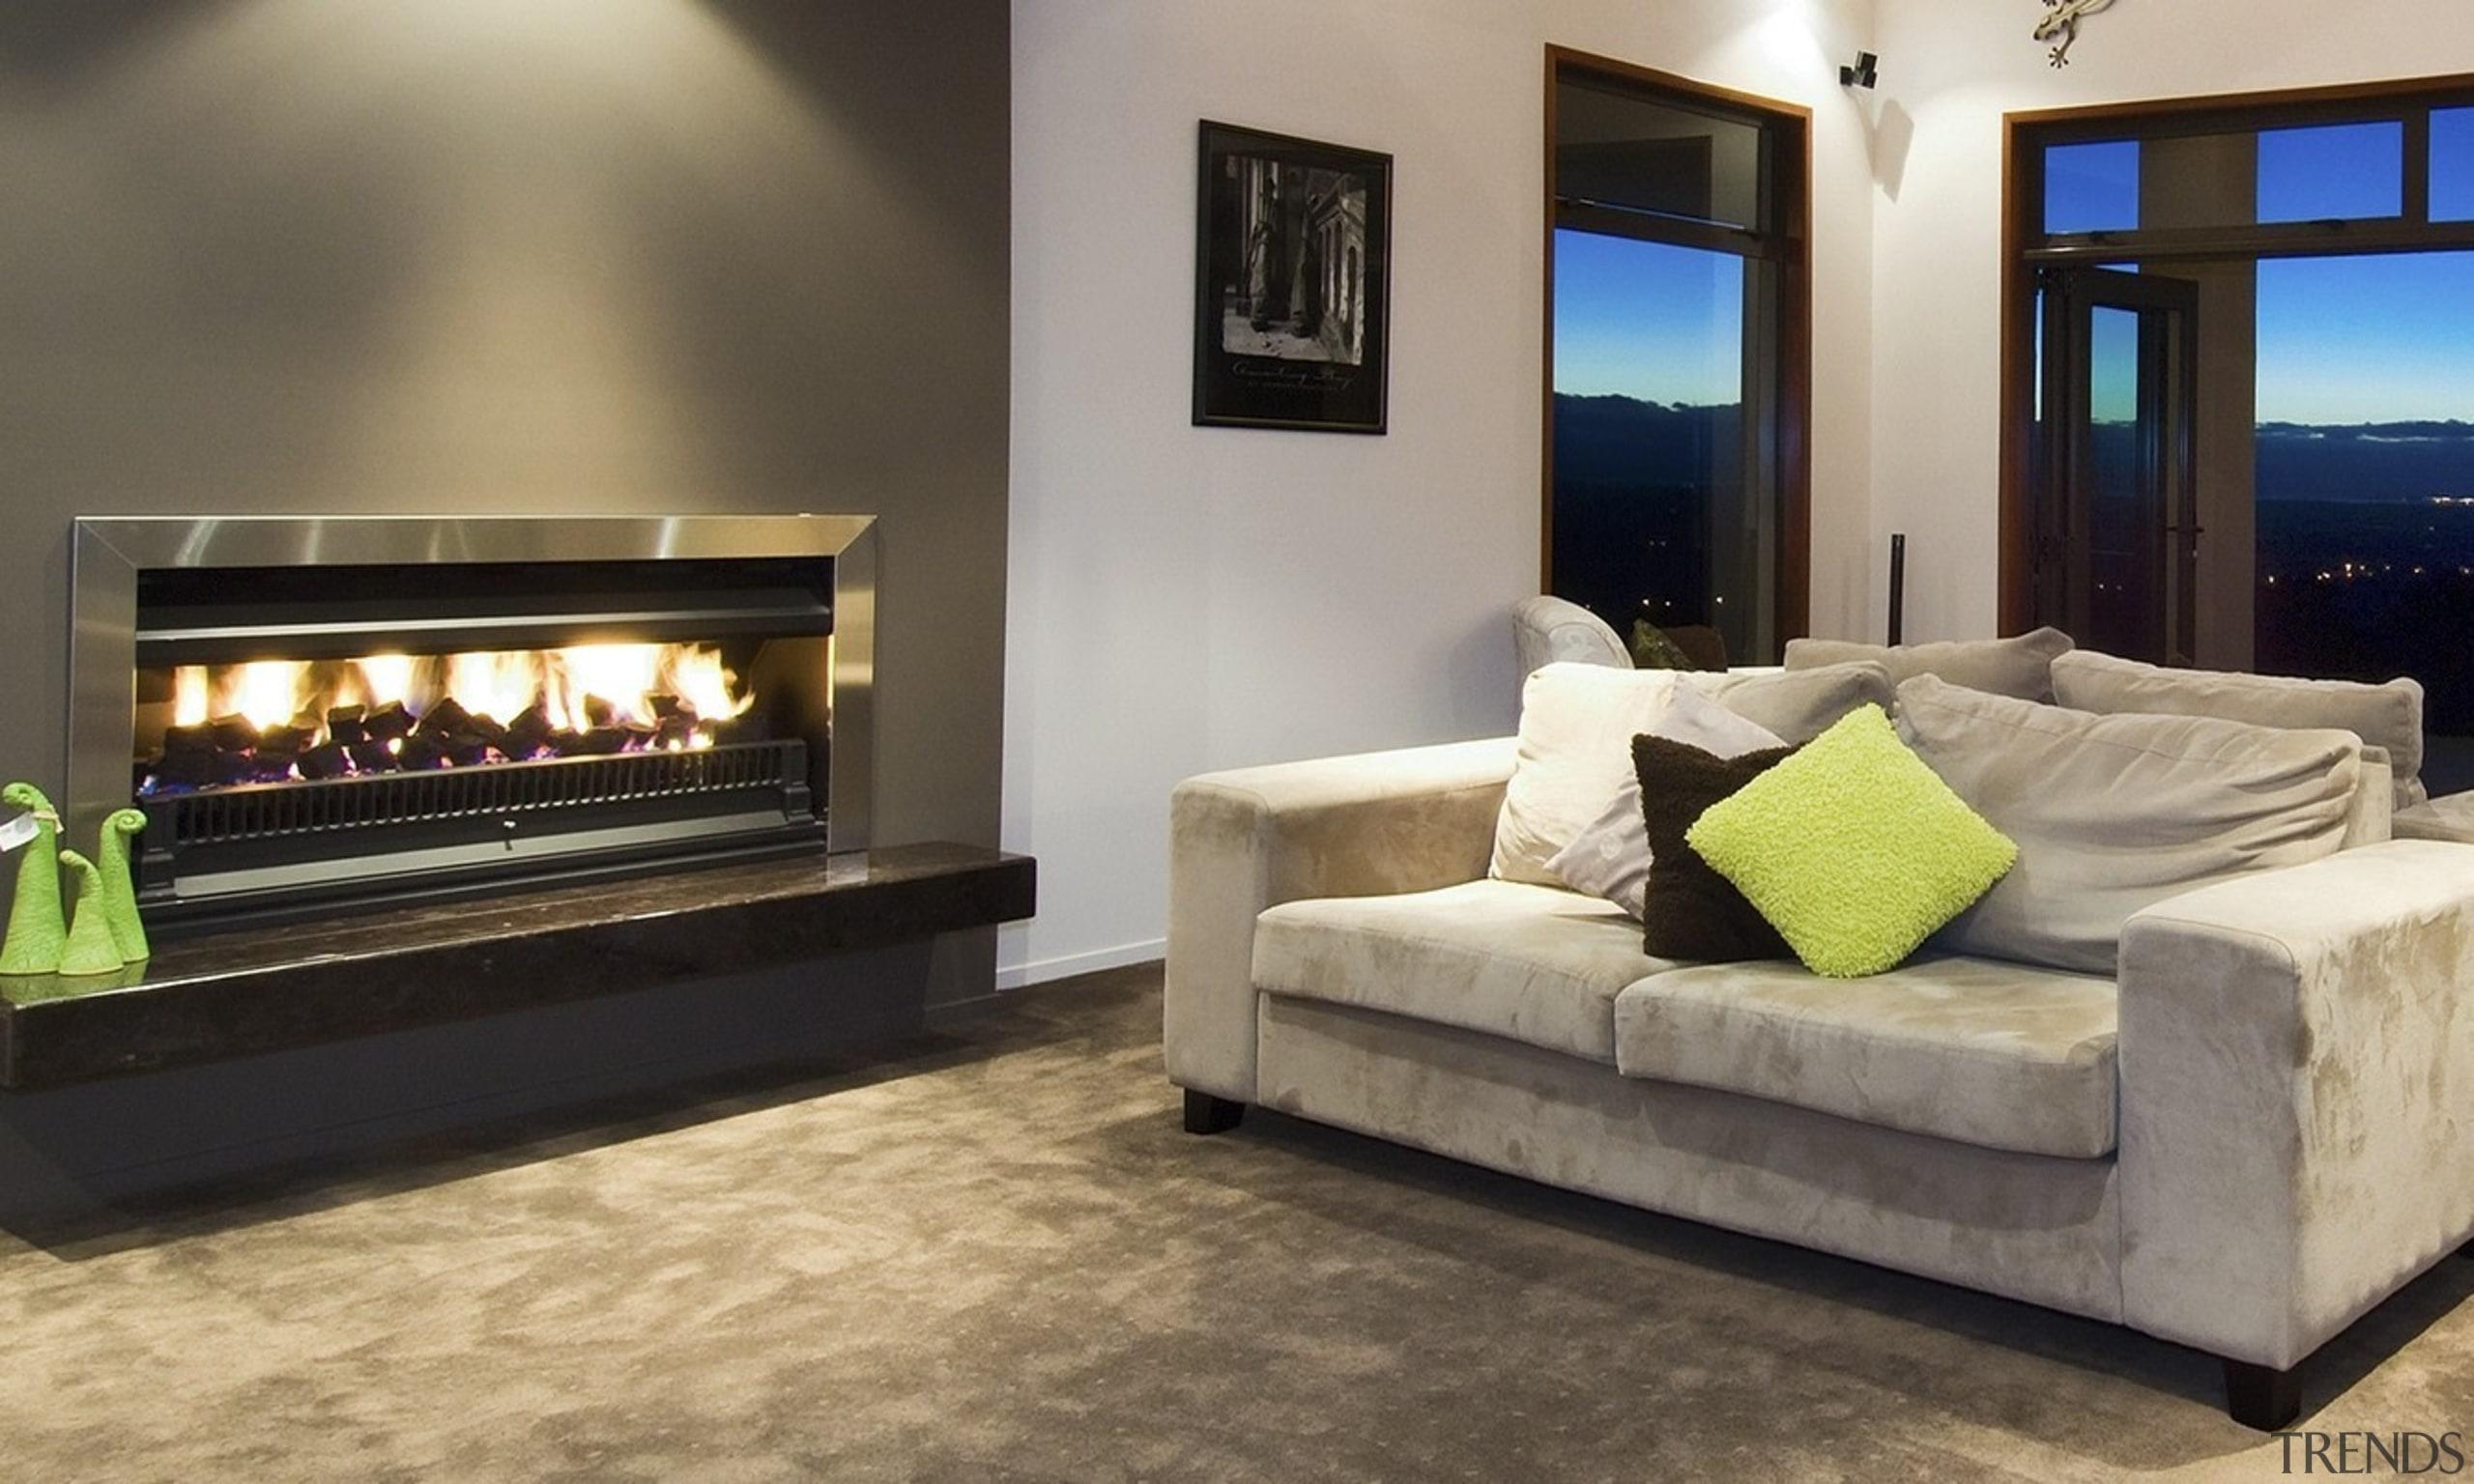 SG1100 Open Gas - SG1100 Open Gas - fireplace, floor, flooring, furniture, hearth, home, interior design, living room, property, gray